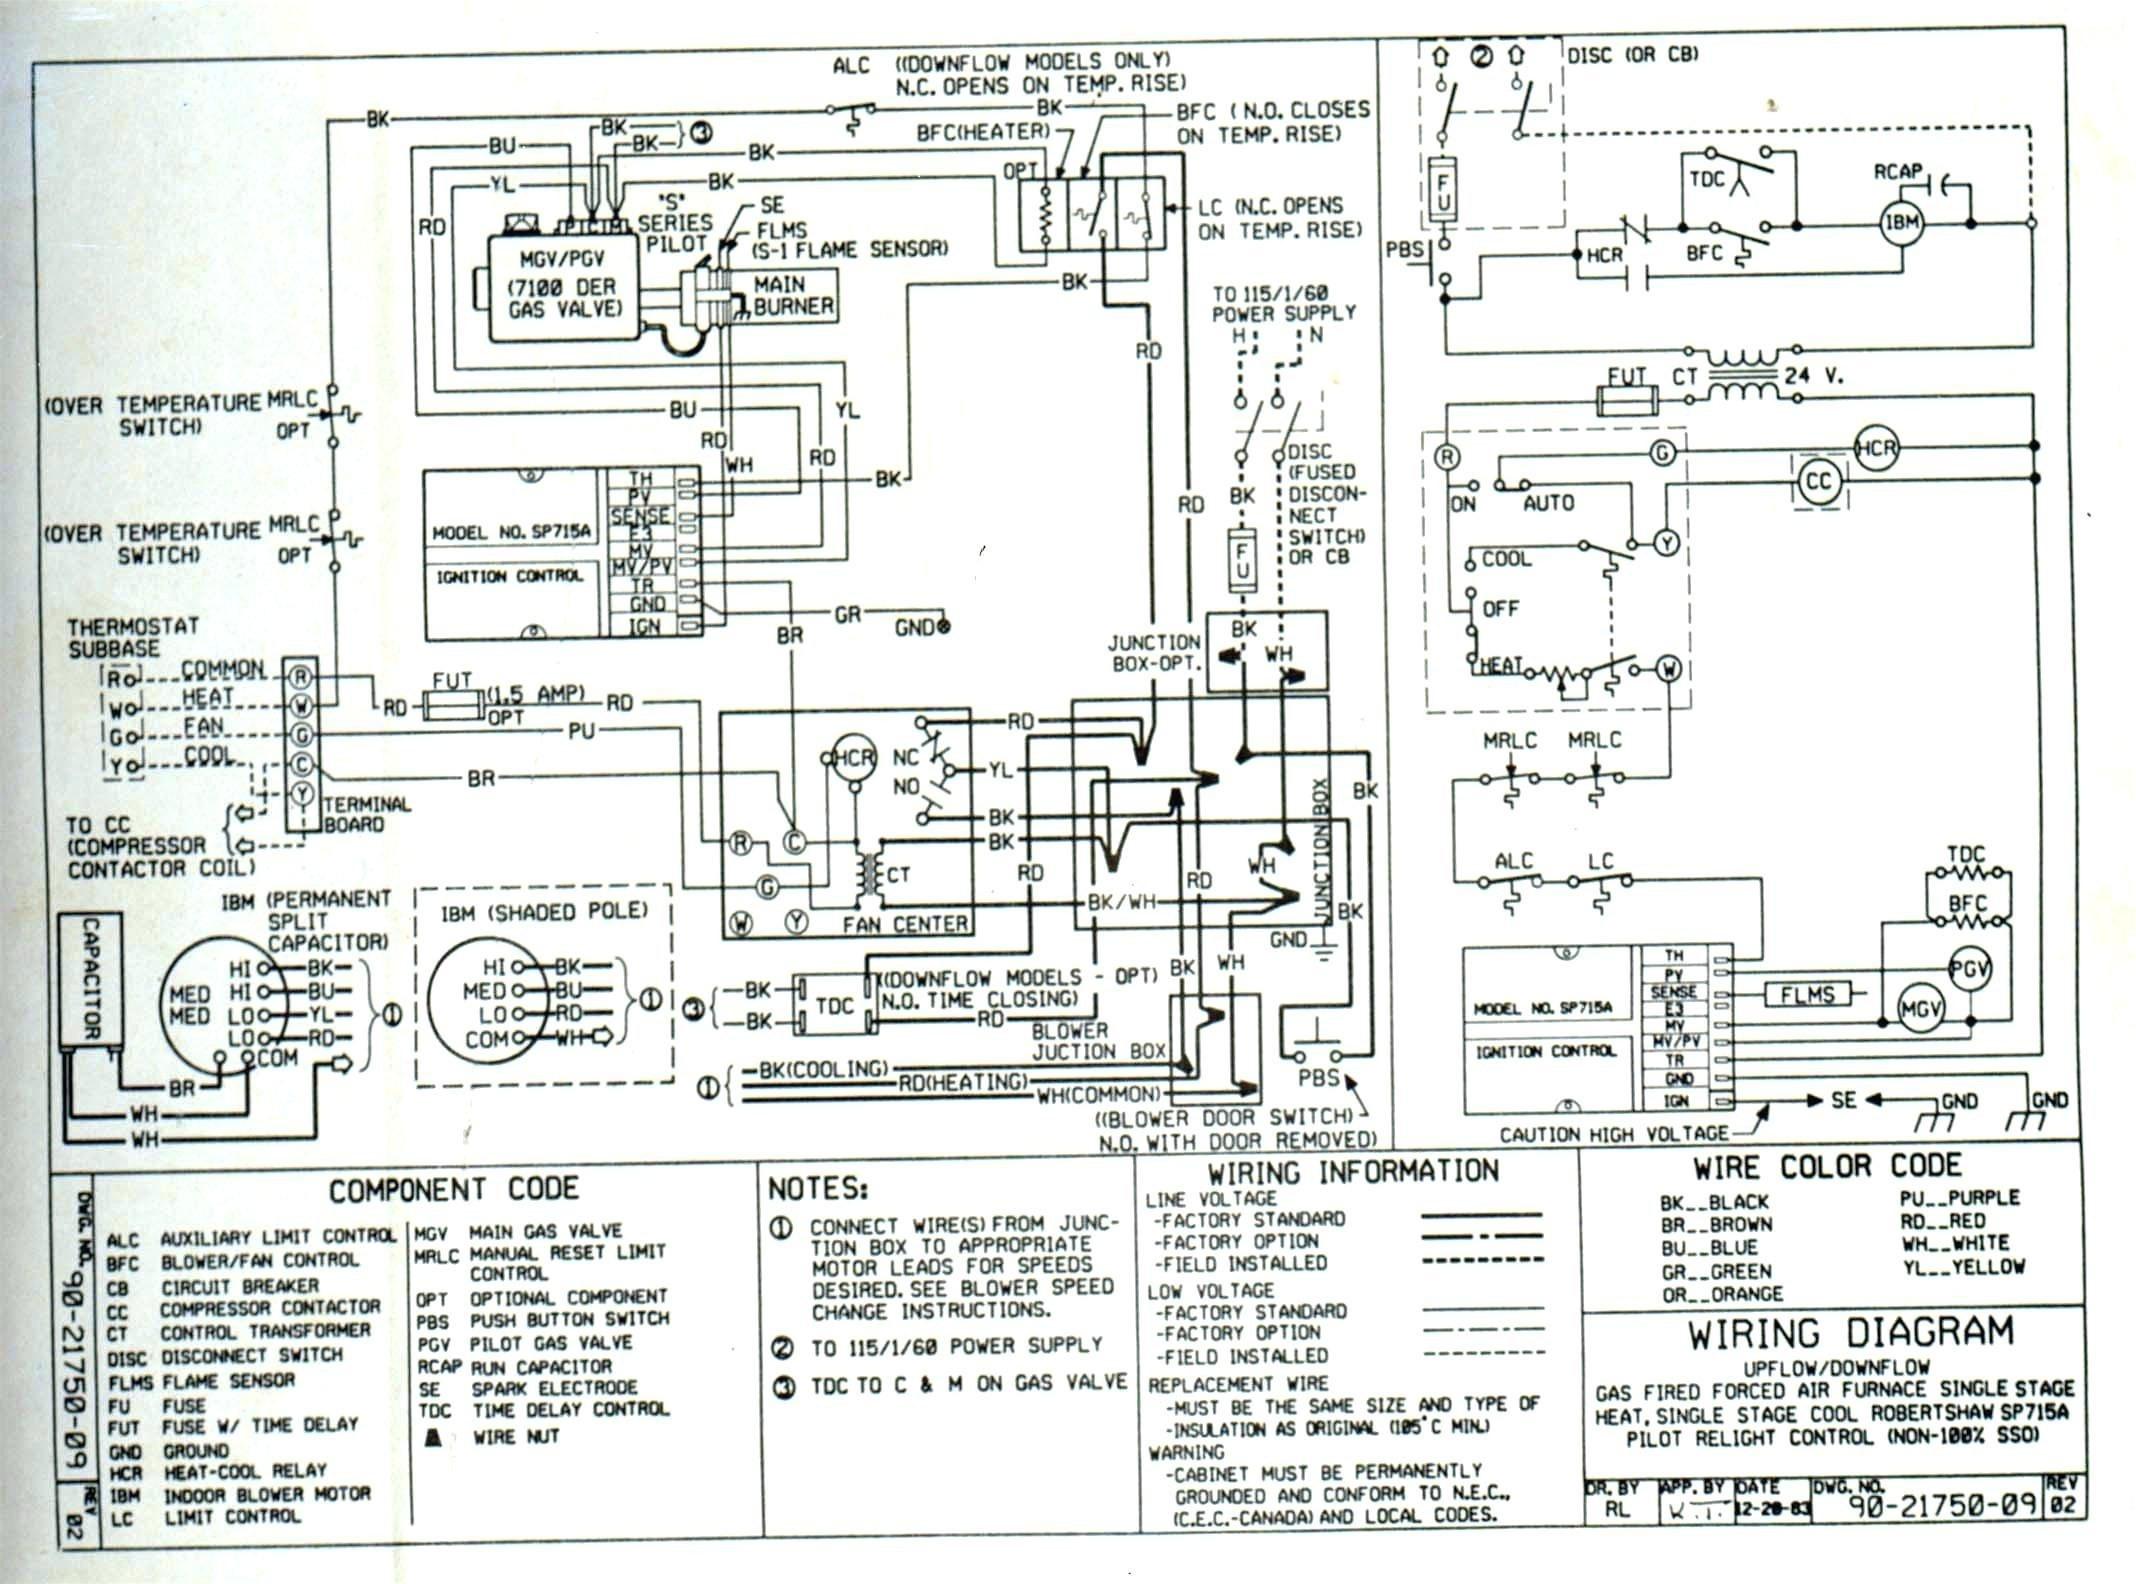 Vdo Oil Tem Wiring Diagram Sc400 Fuse Diagram Of Vdo Oil Tem Wiring Diagram